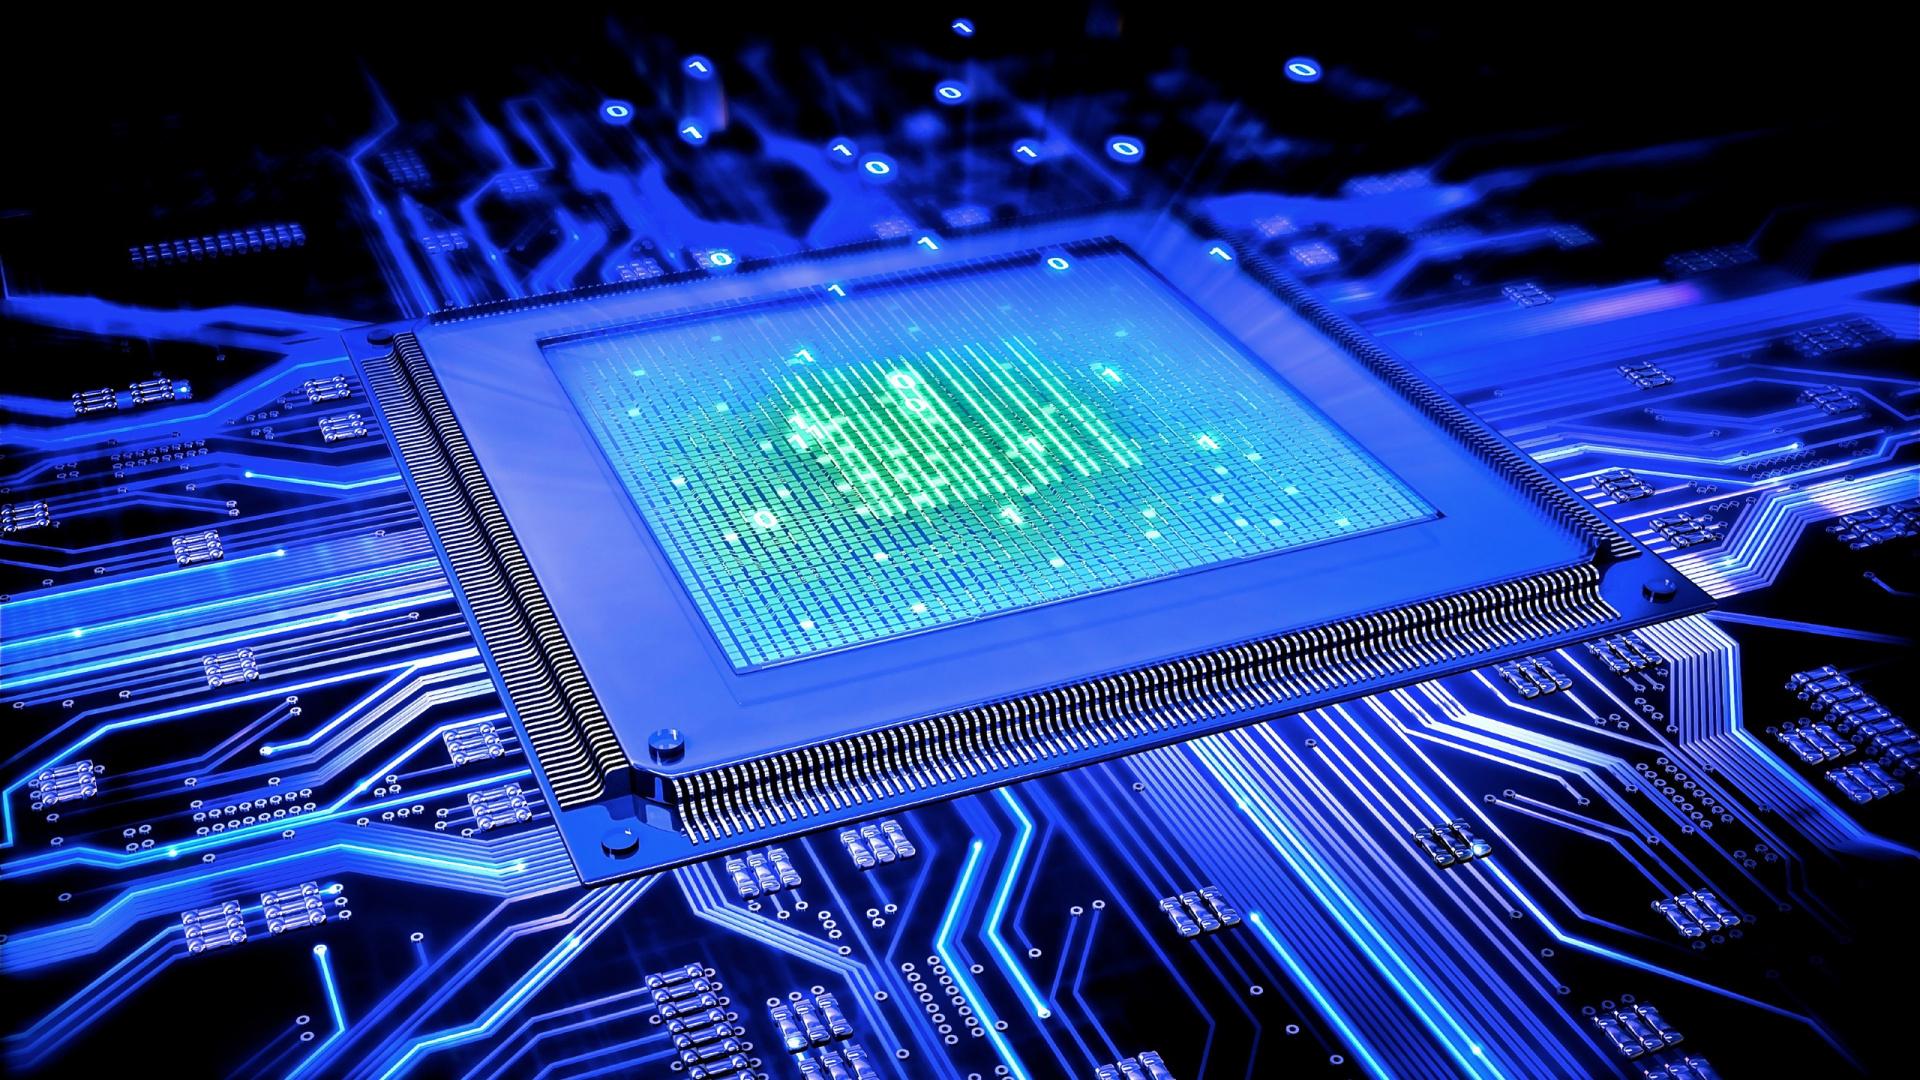 14025-centralnyj_processor-tehnologii-sinij-cpu-elektronnaya_tehnika-1920x1080